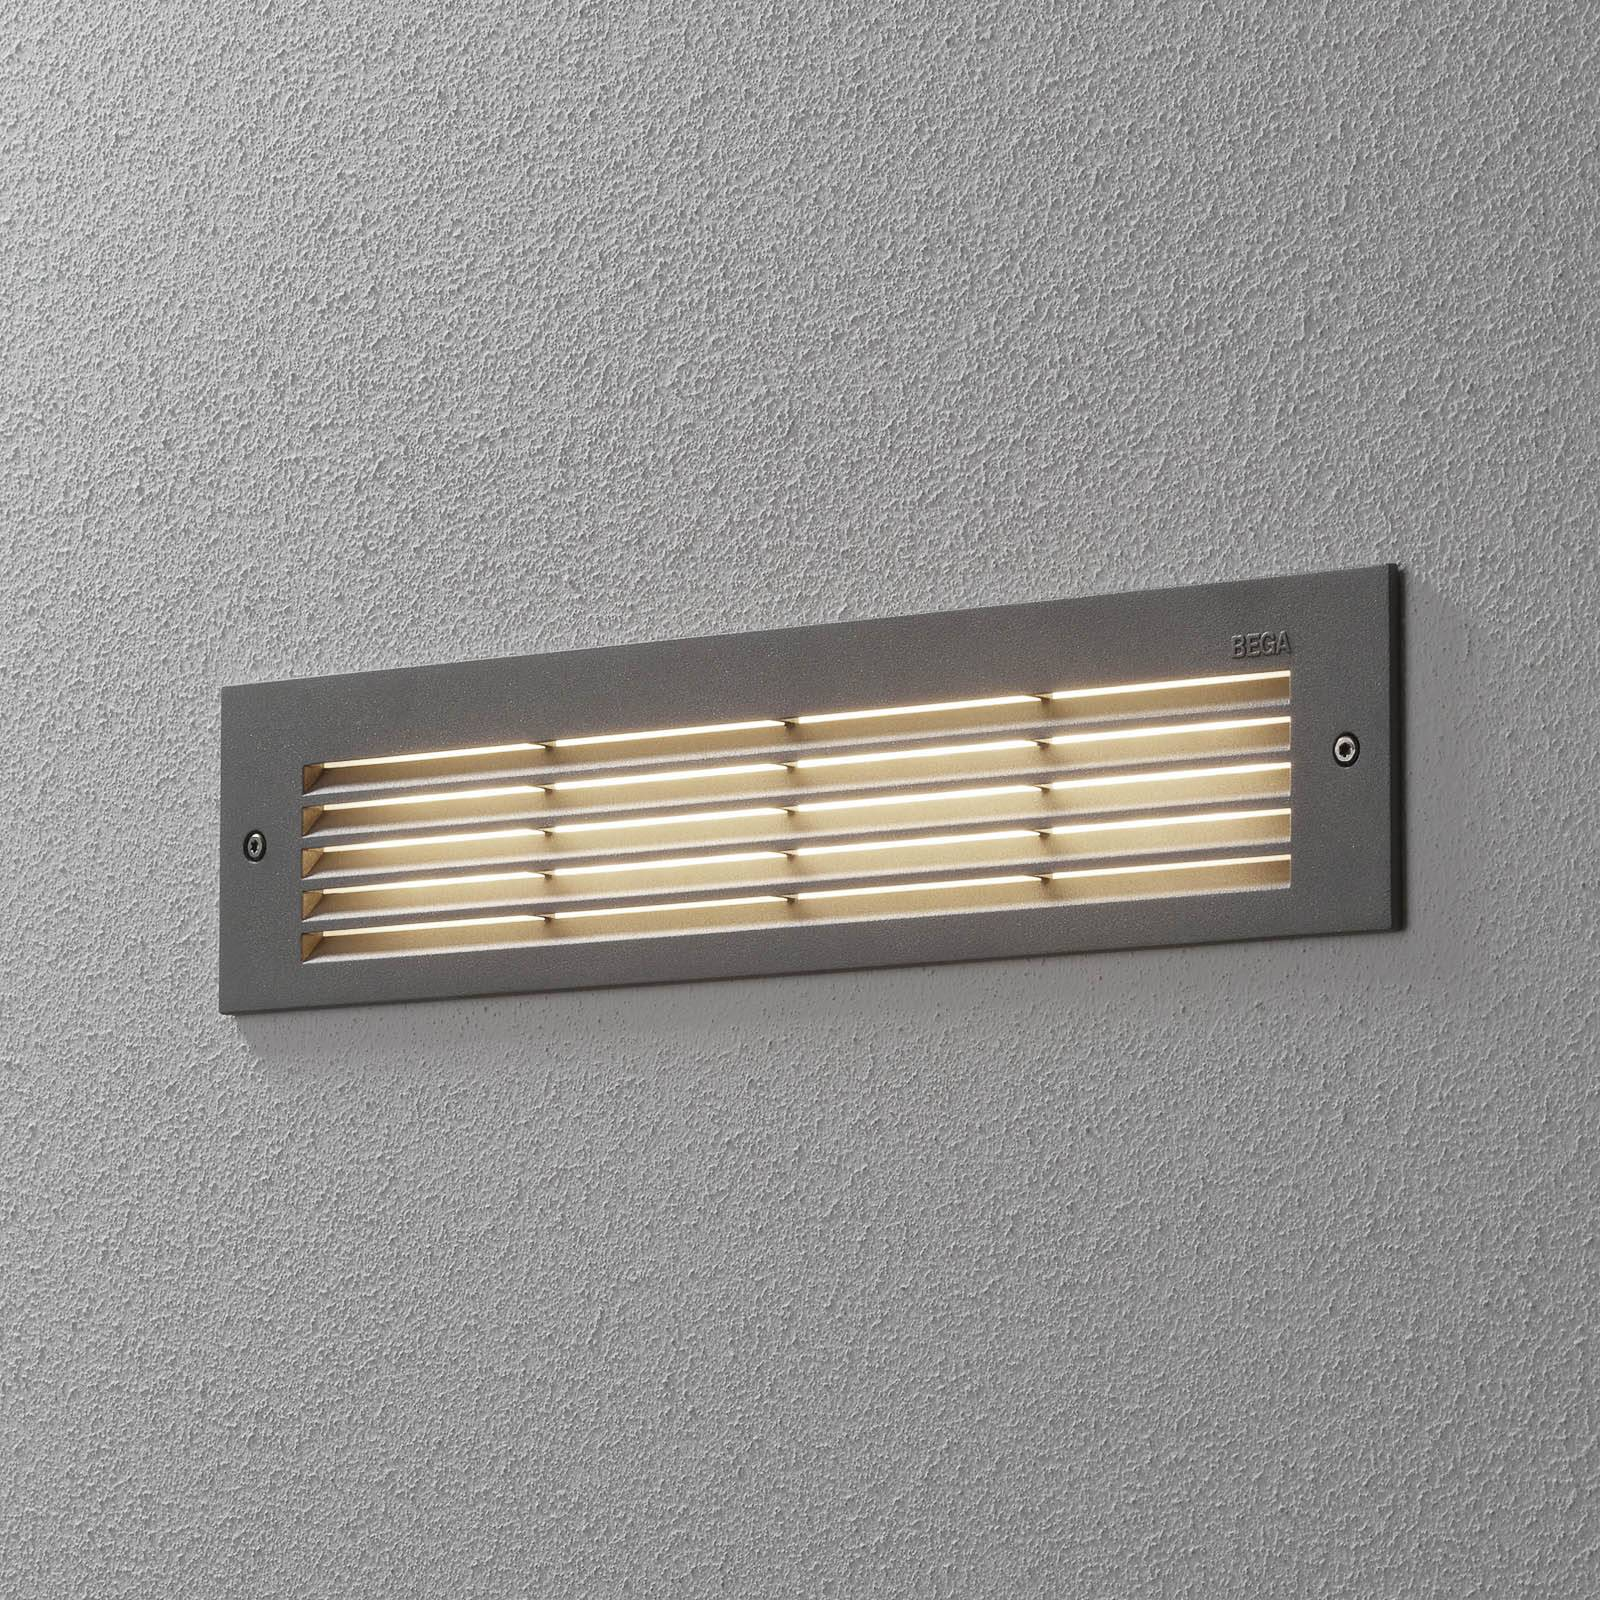 BEGA 33019 LED-seinäuppovalo 3000K hopea 32 cm